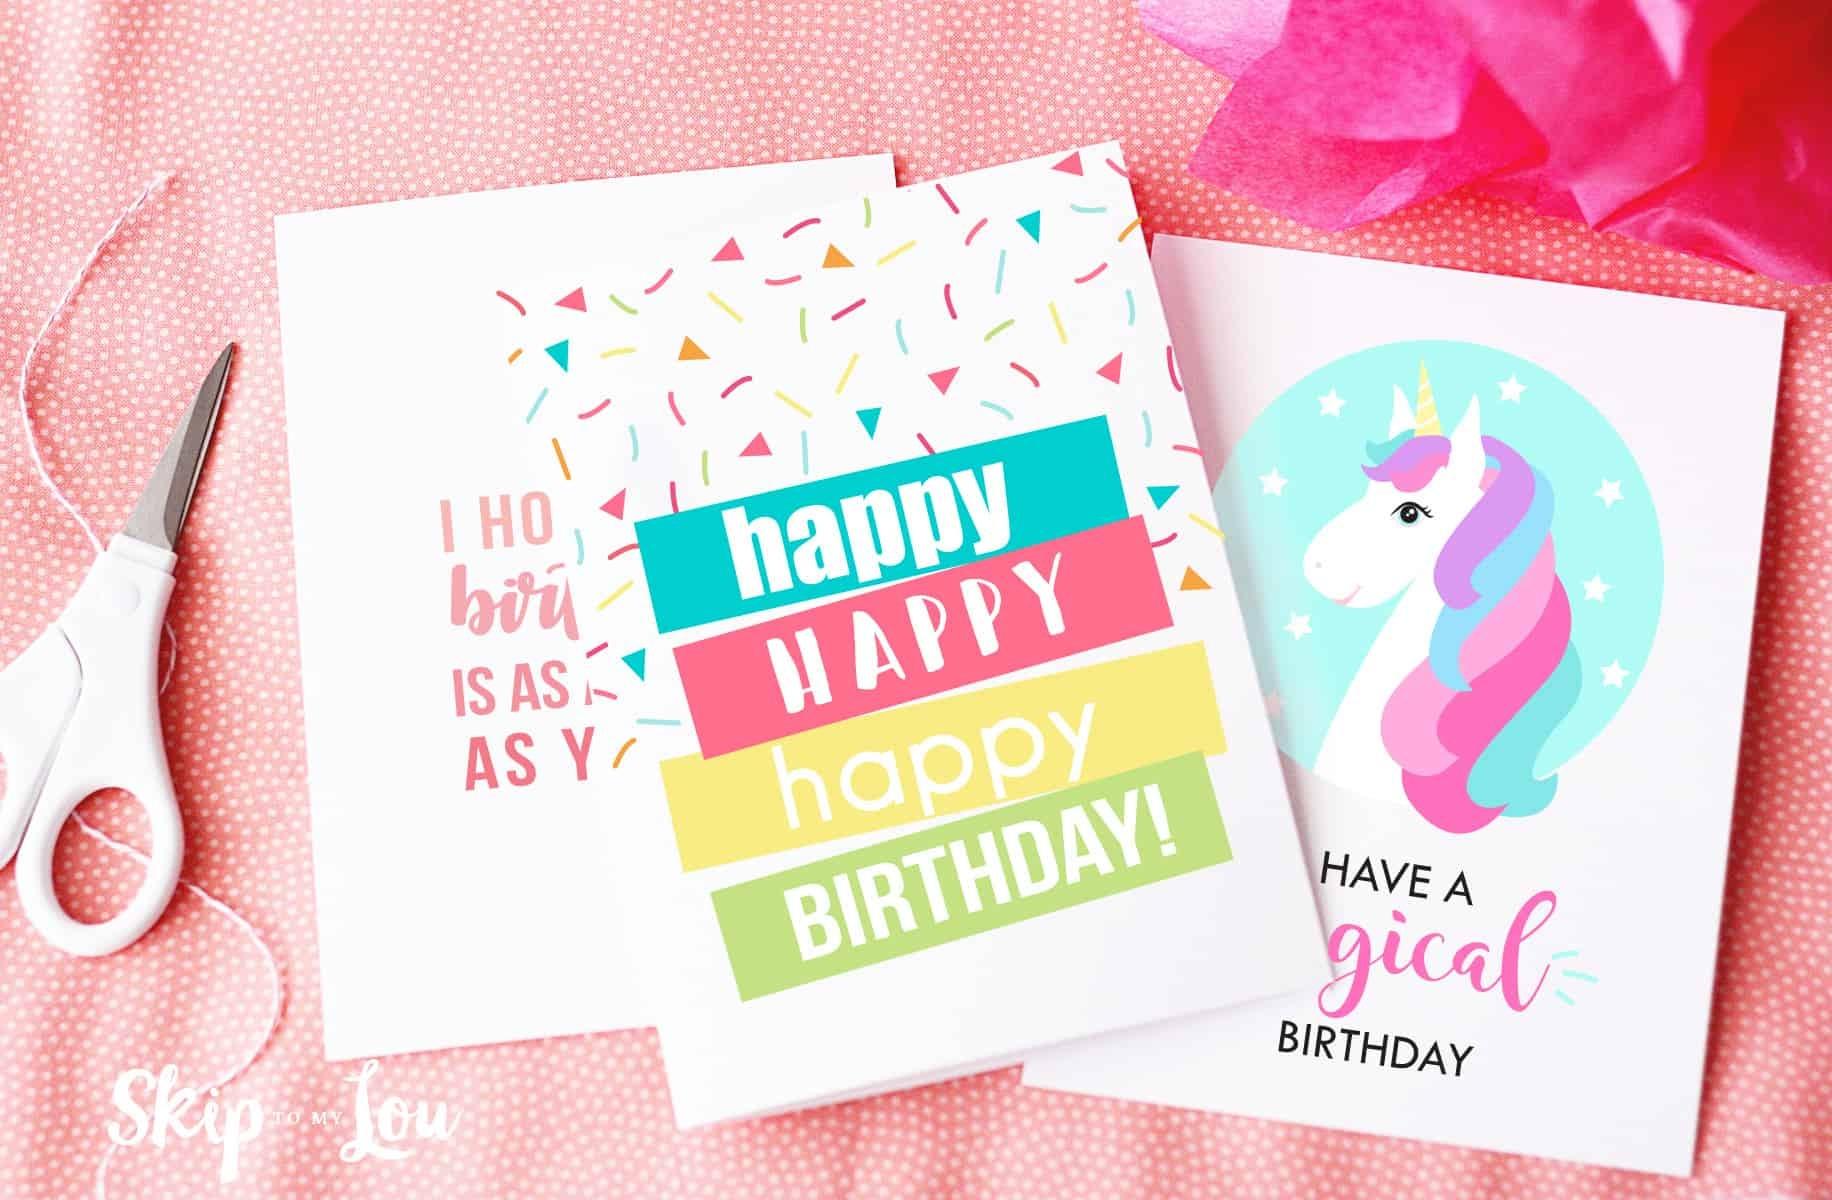 Free Printable Birthday Cards   Skip To My Lou - Free Printable Birthday Cards For Your Best Friend